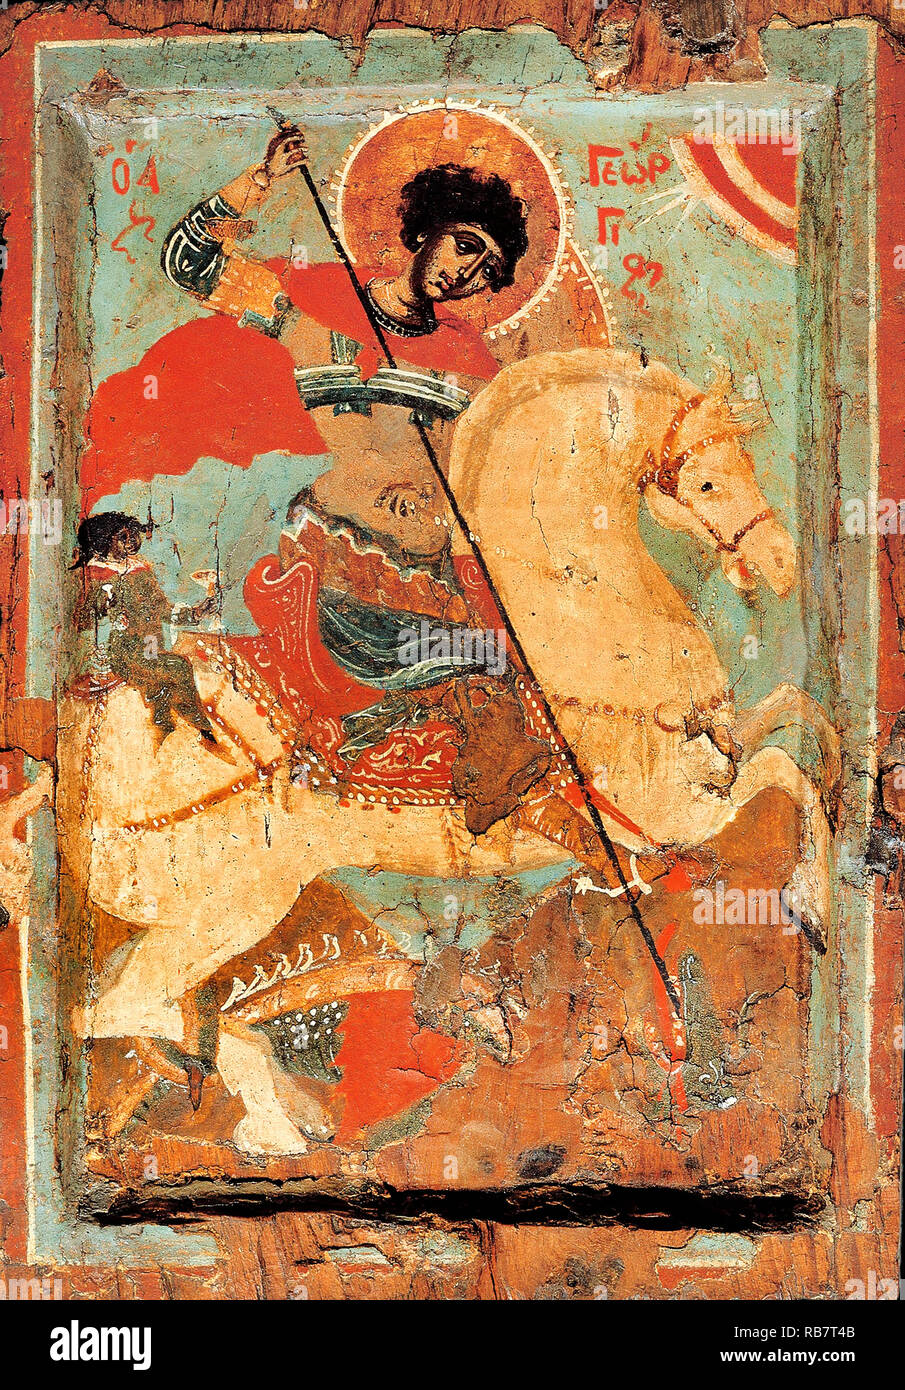 Macedonian workshop, St. George the Dragon-slayer on Horseback, Circa 1550-1599 Icon, Benaki Museum, Athens, Greece. Stock Photo